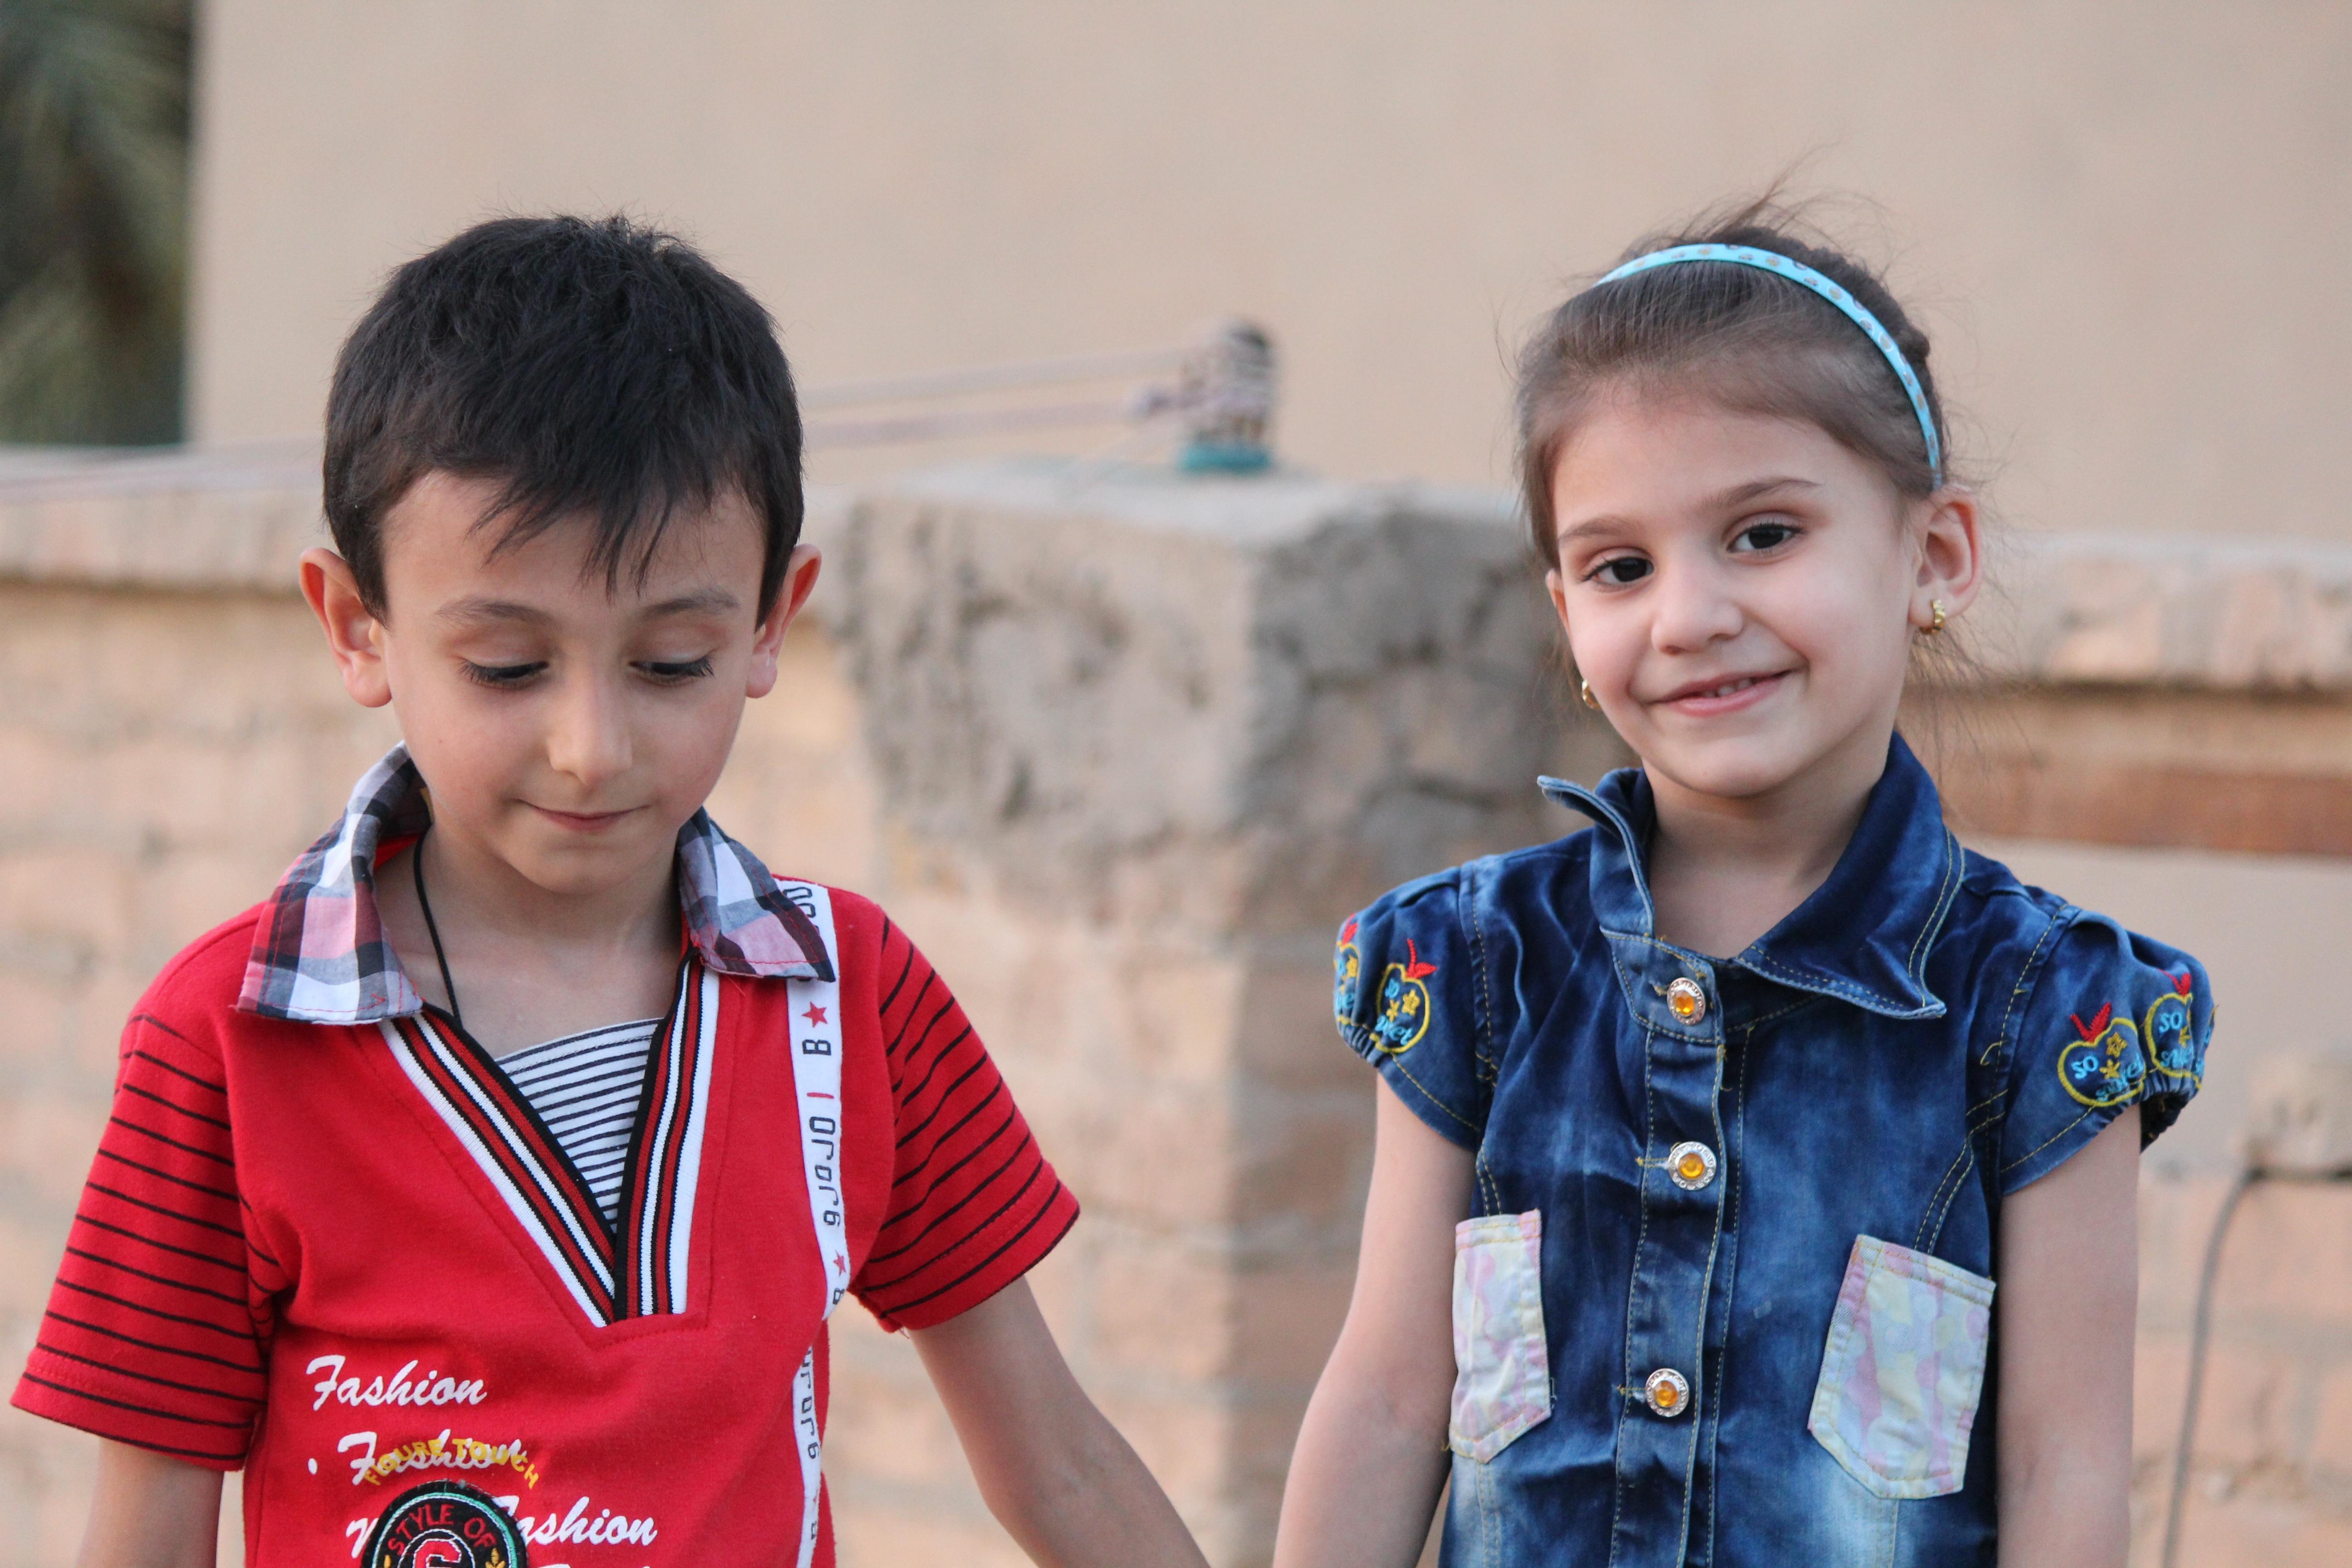 arab-young-sechool-girl-pic